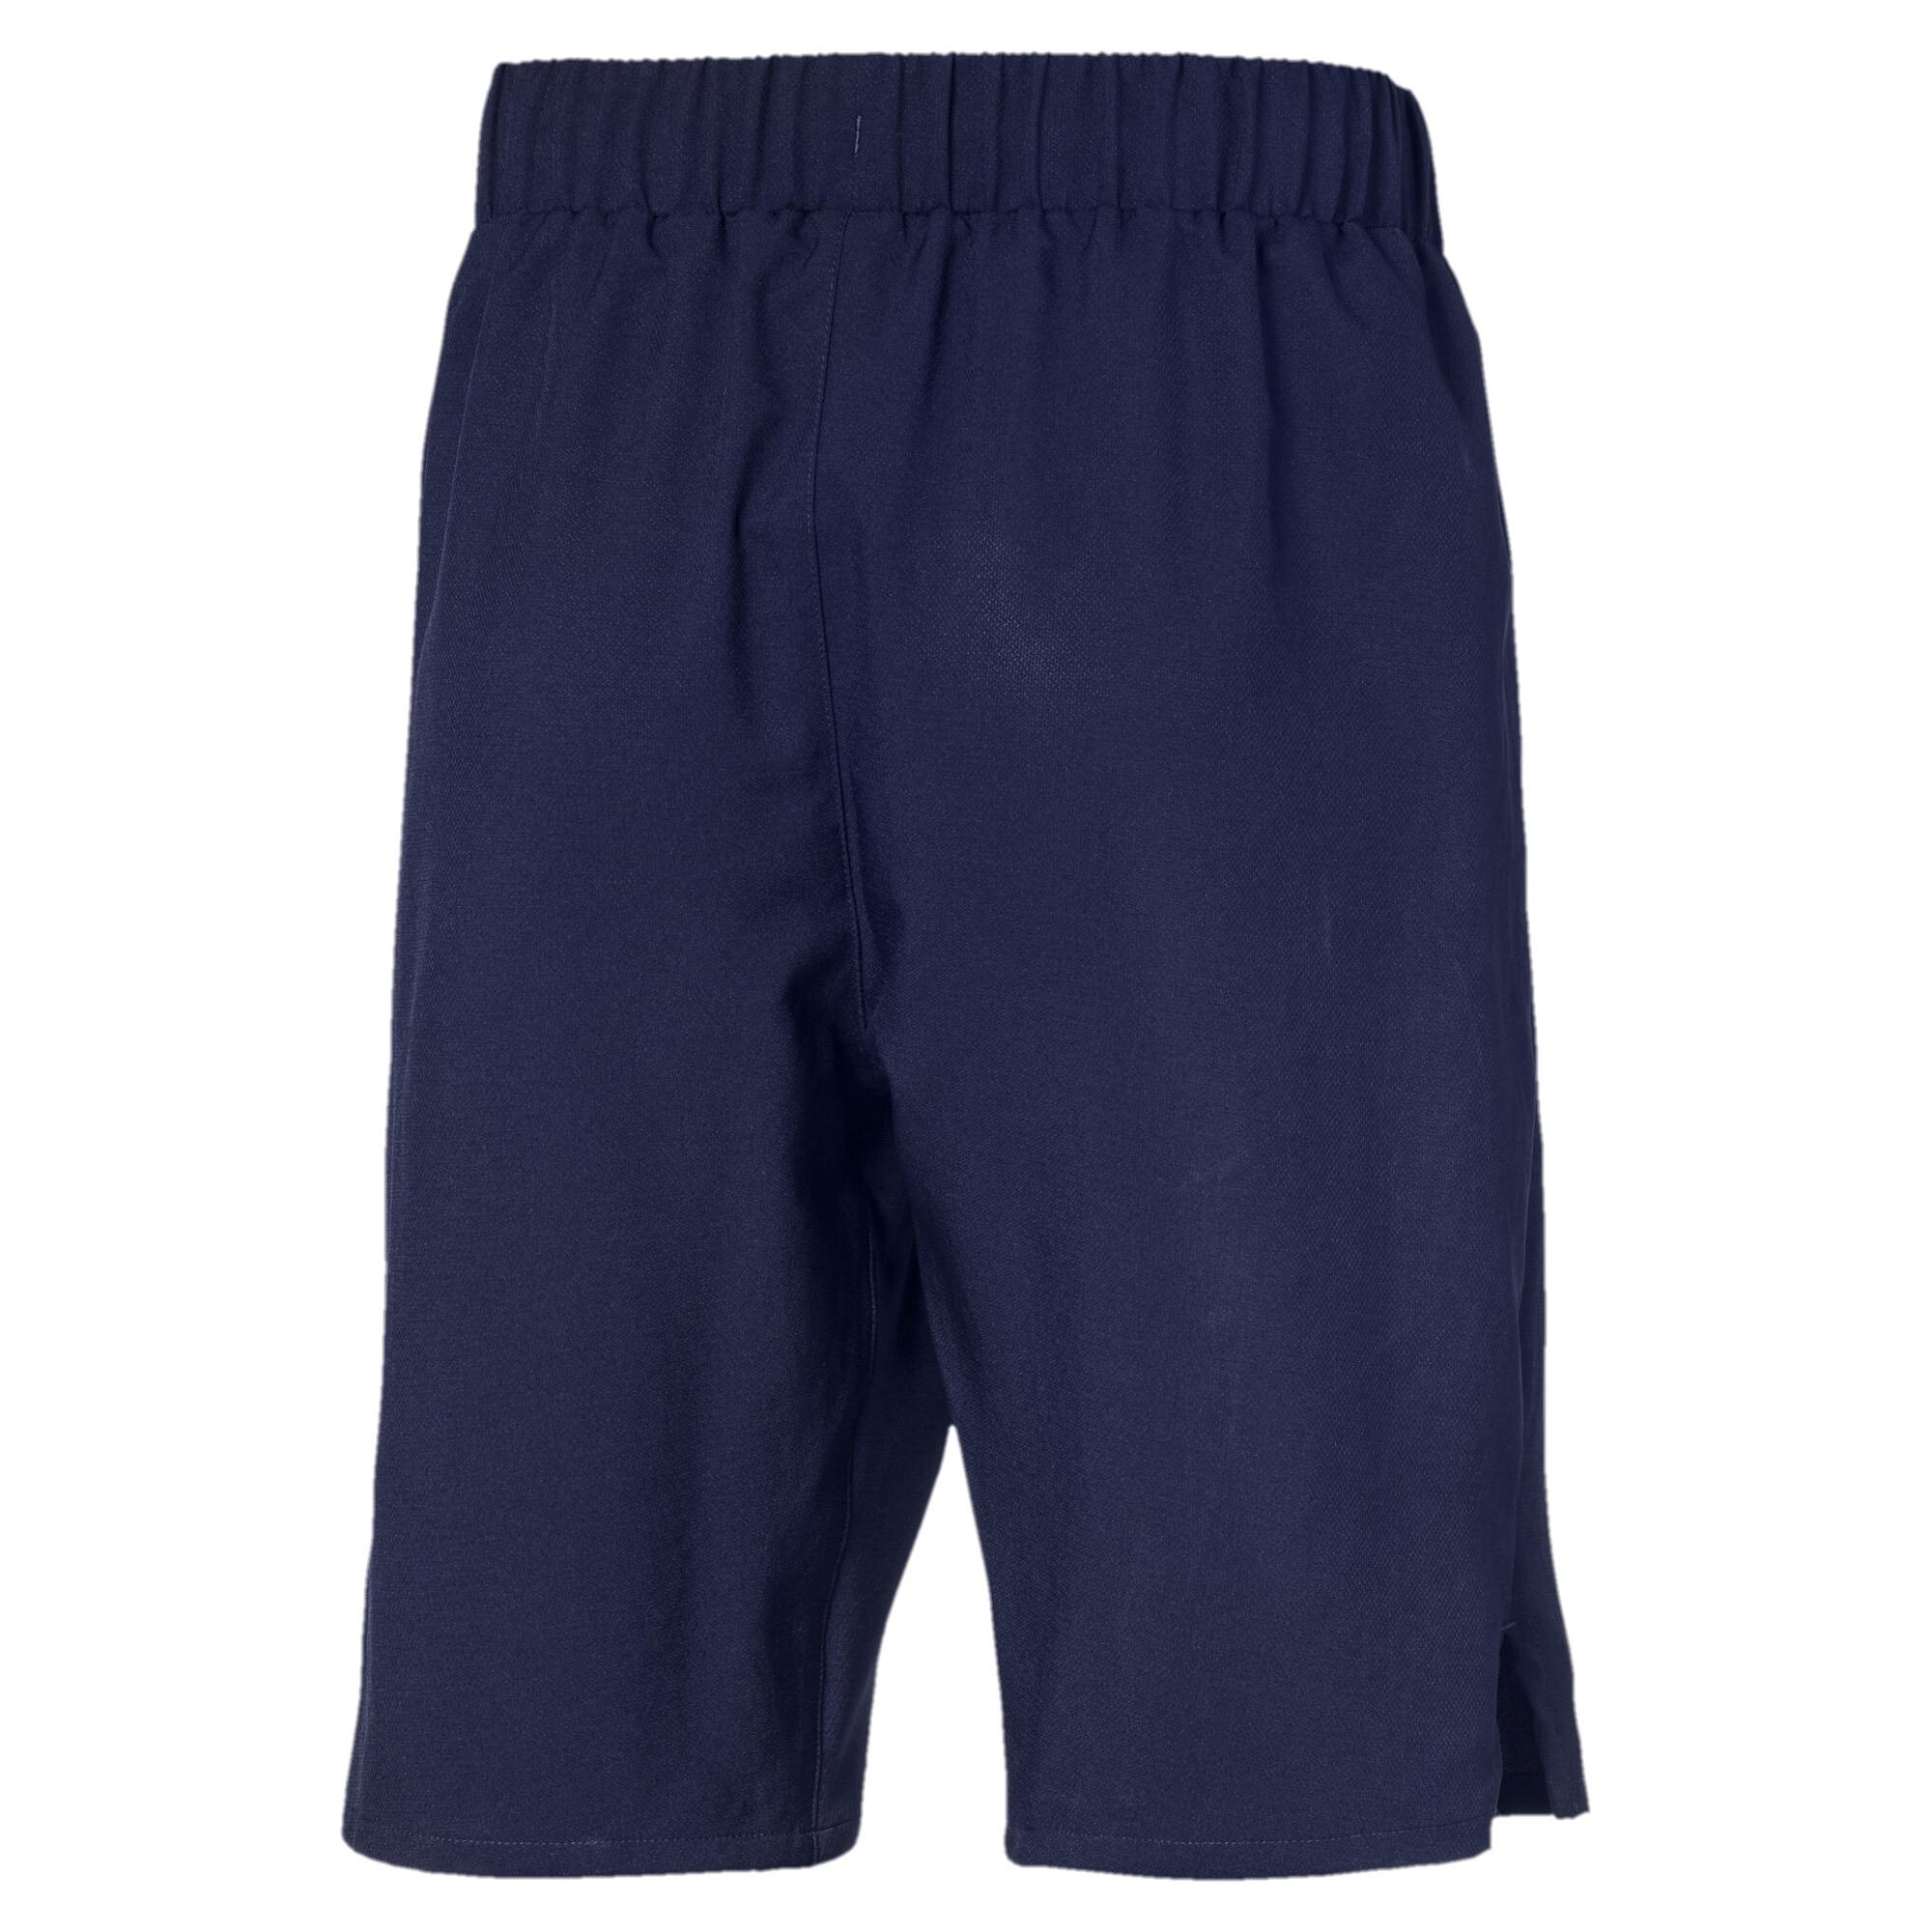 Image Puma Active Sports Woven Boys' Shorts #2